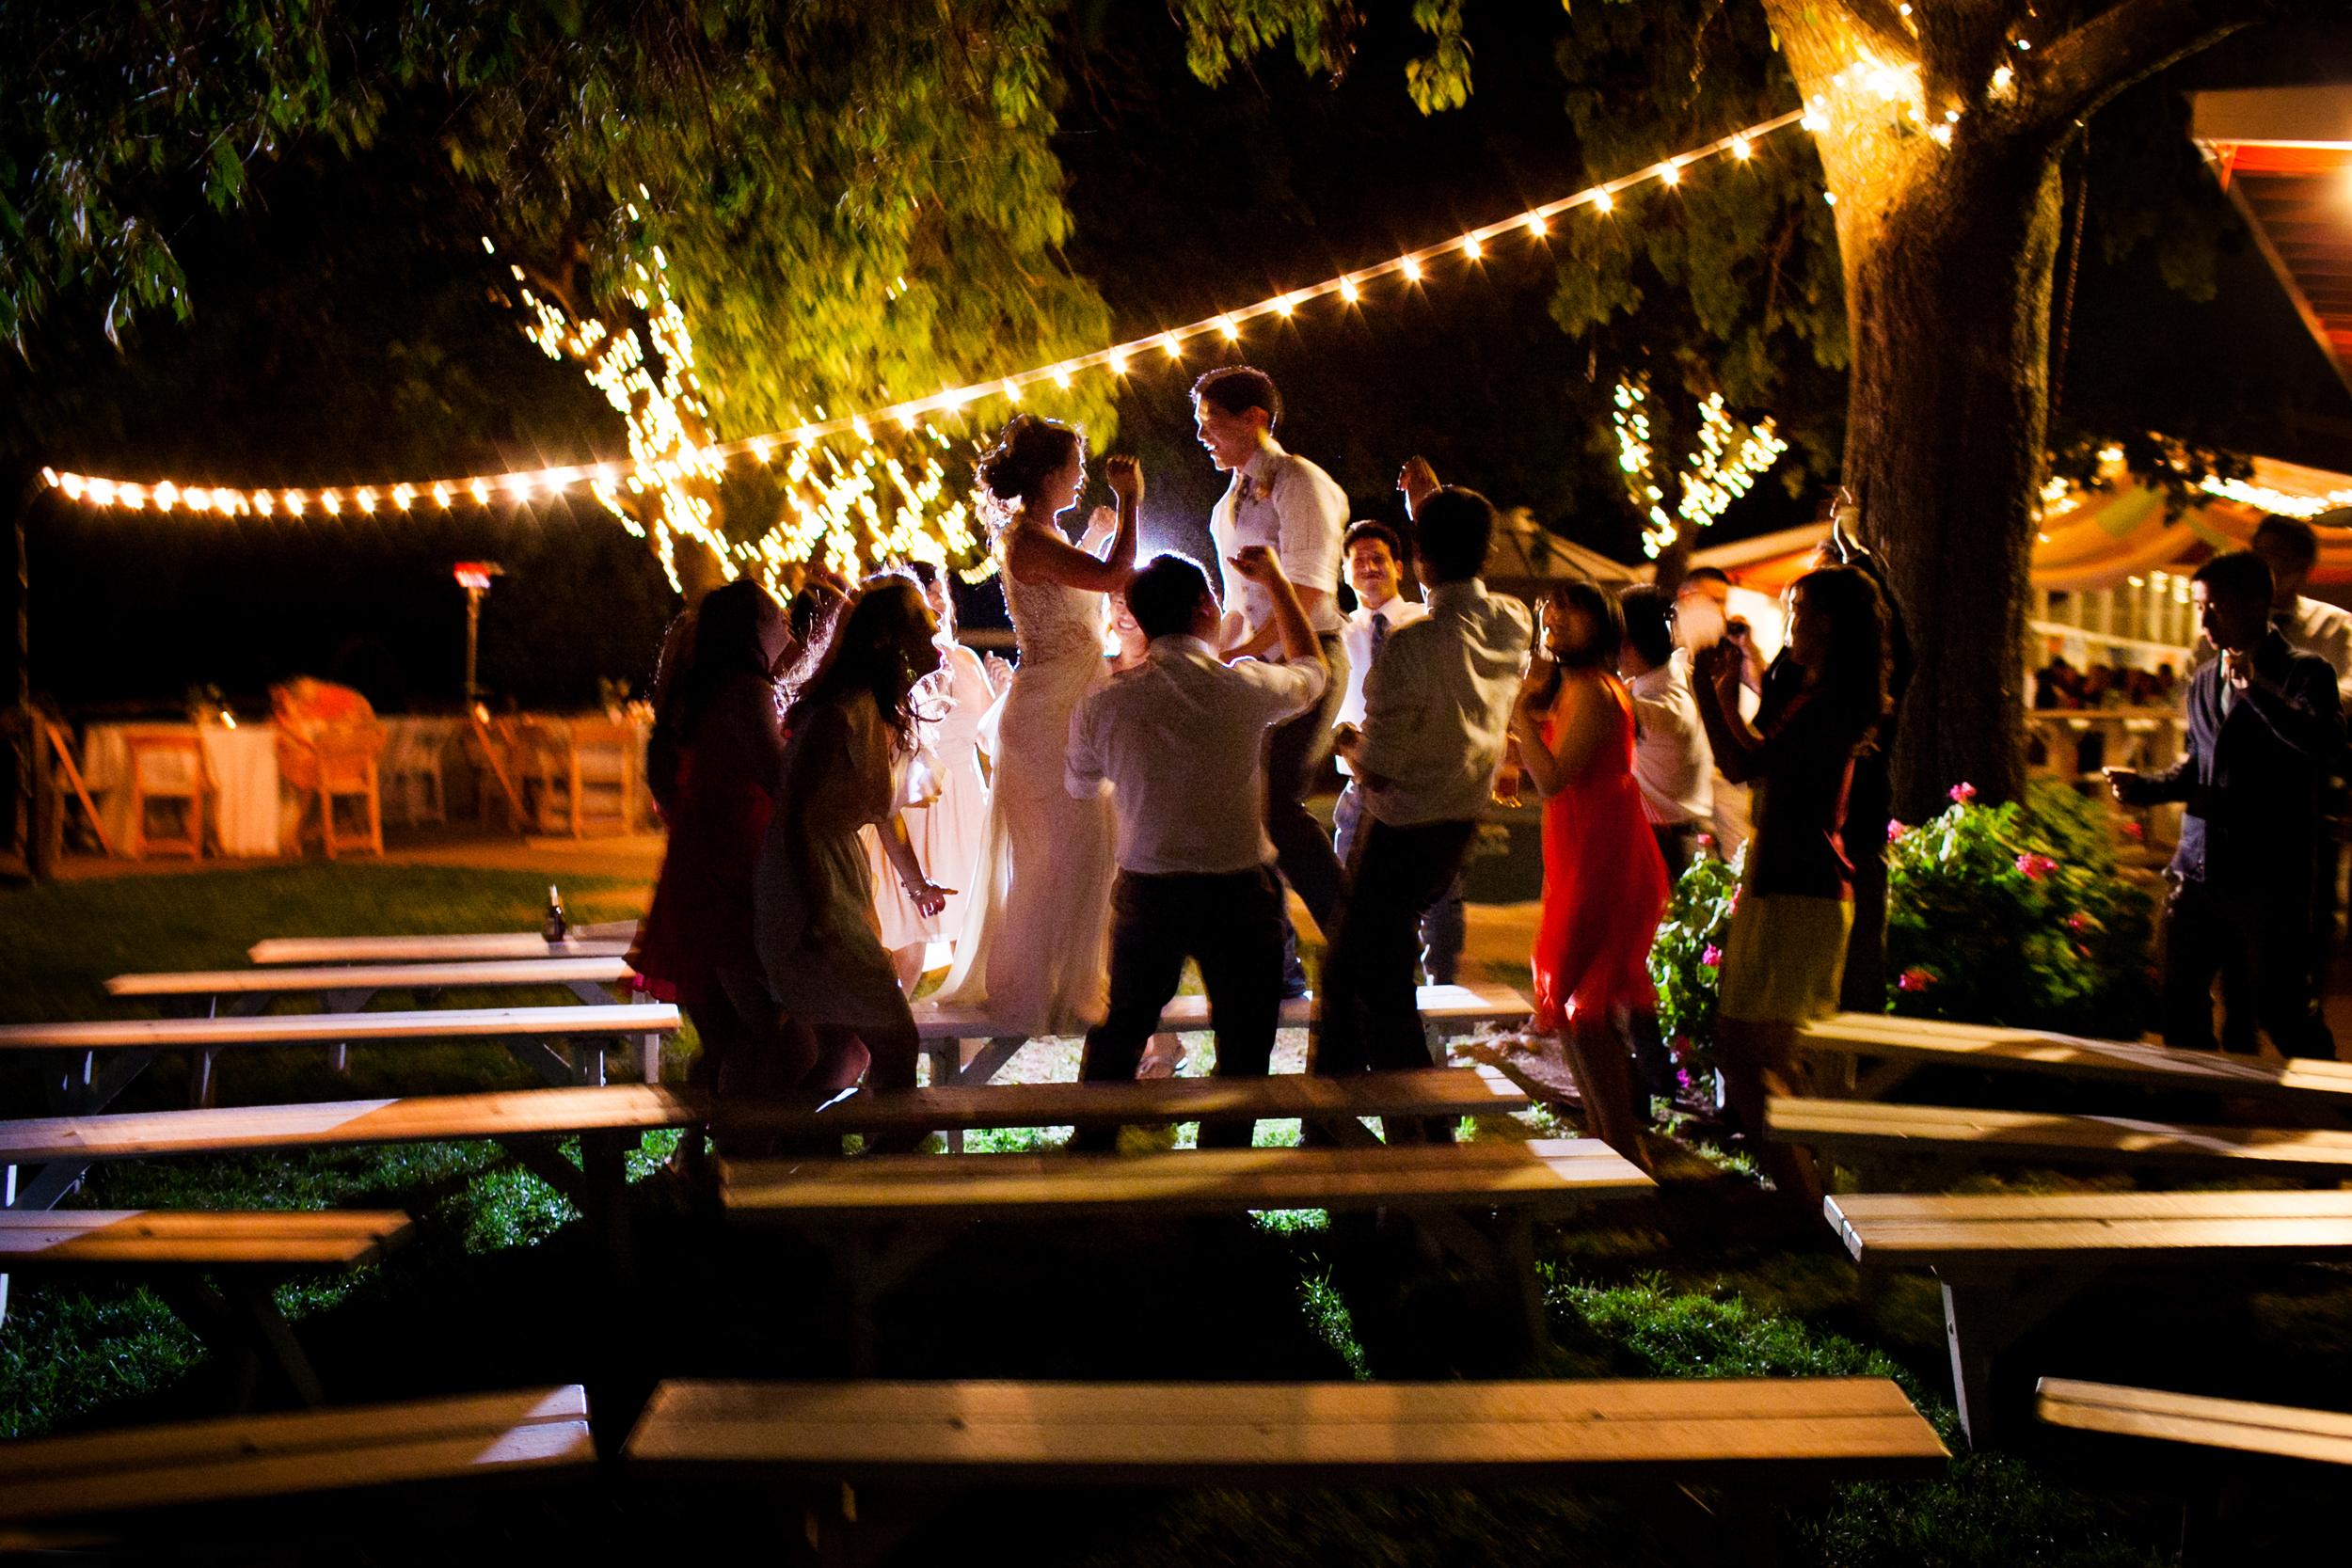 Diablo_Ranch_Wedding_Photography_Becky_Will-39.JPG